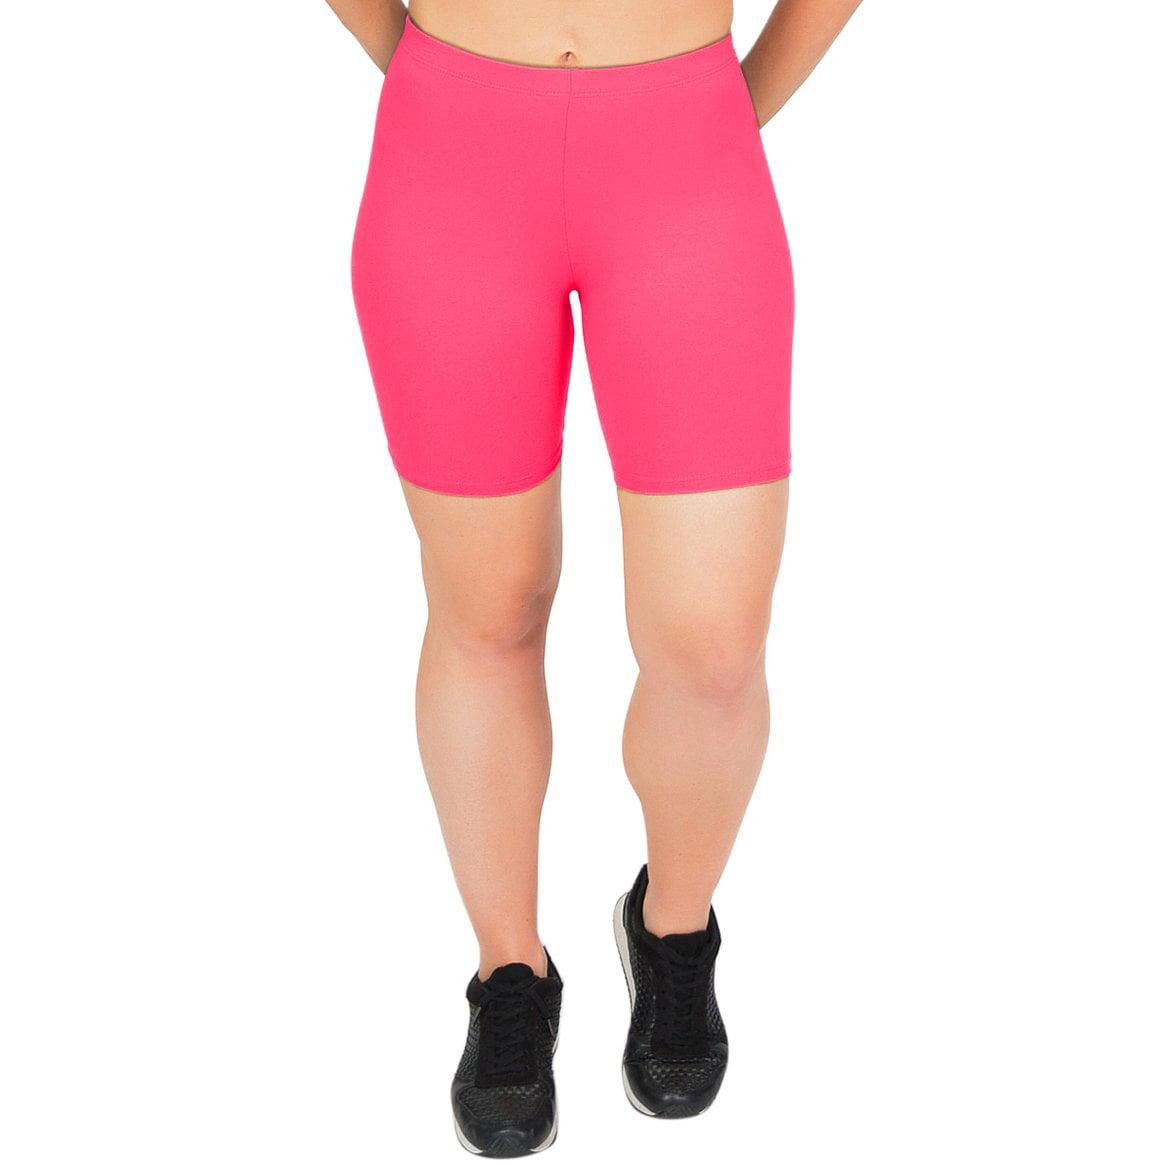 Rose Mechanic American Flag Womens Active Yoga Shorts Workout Running Shorts